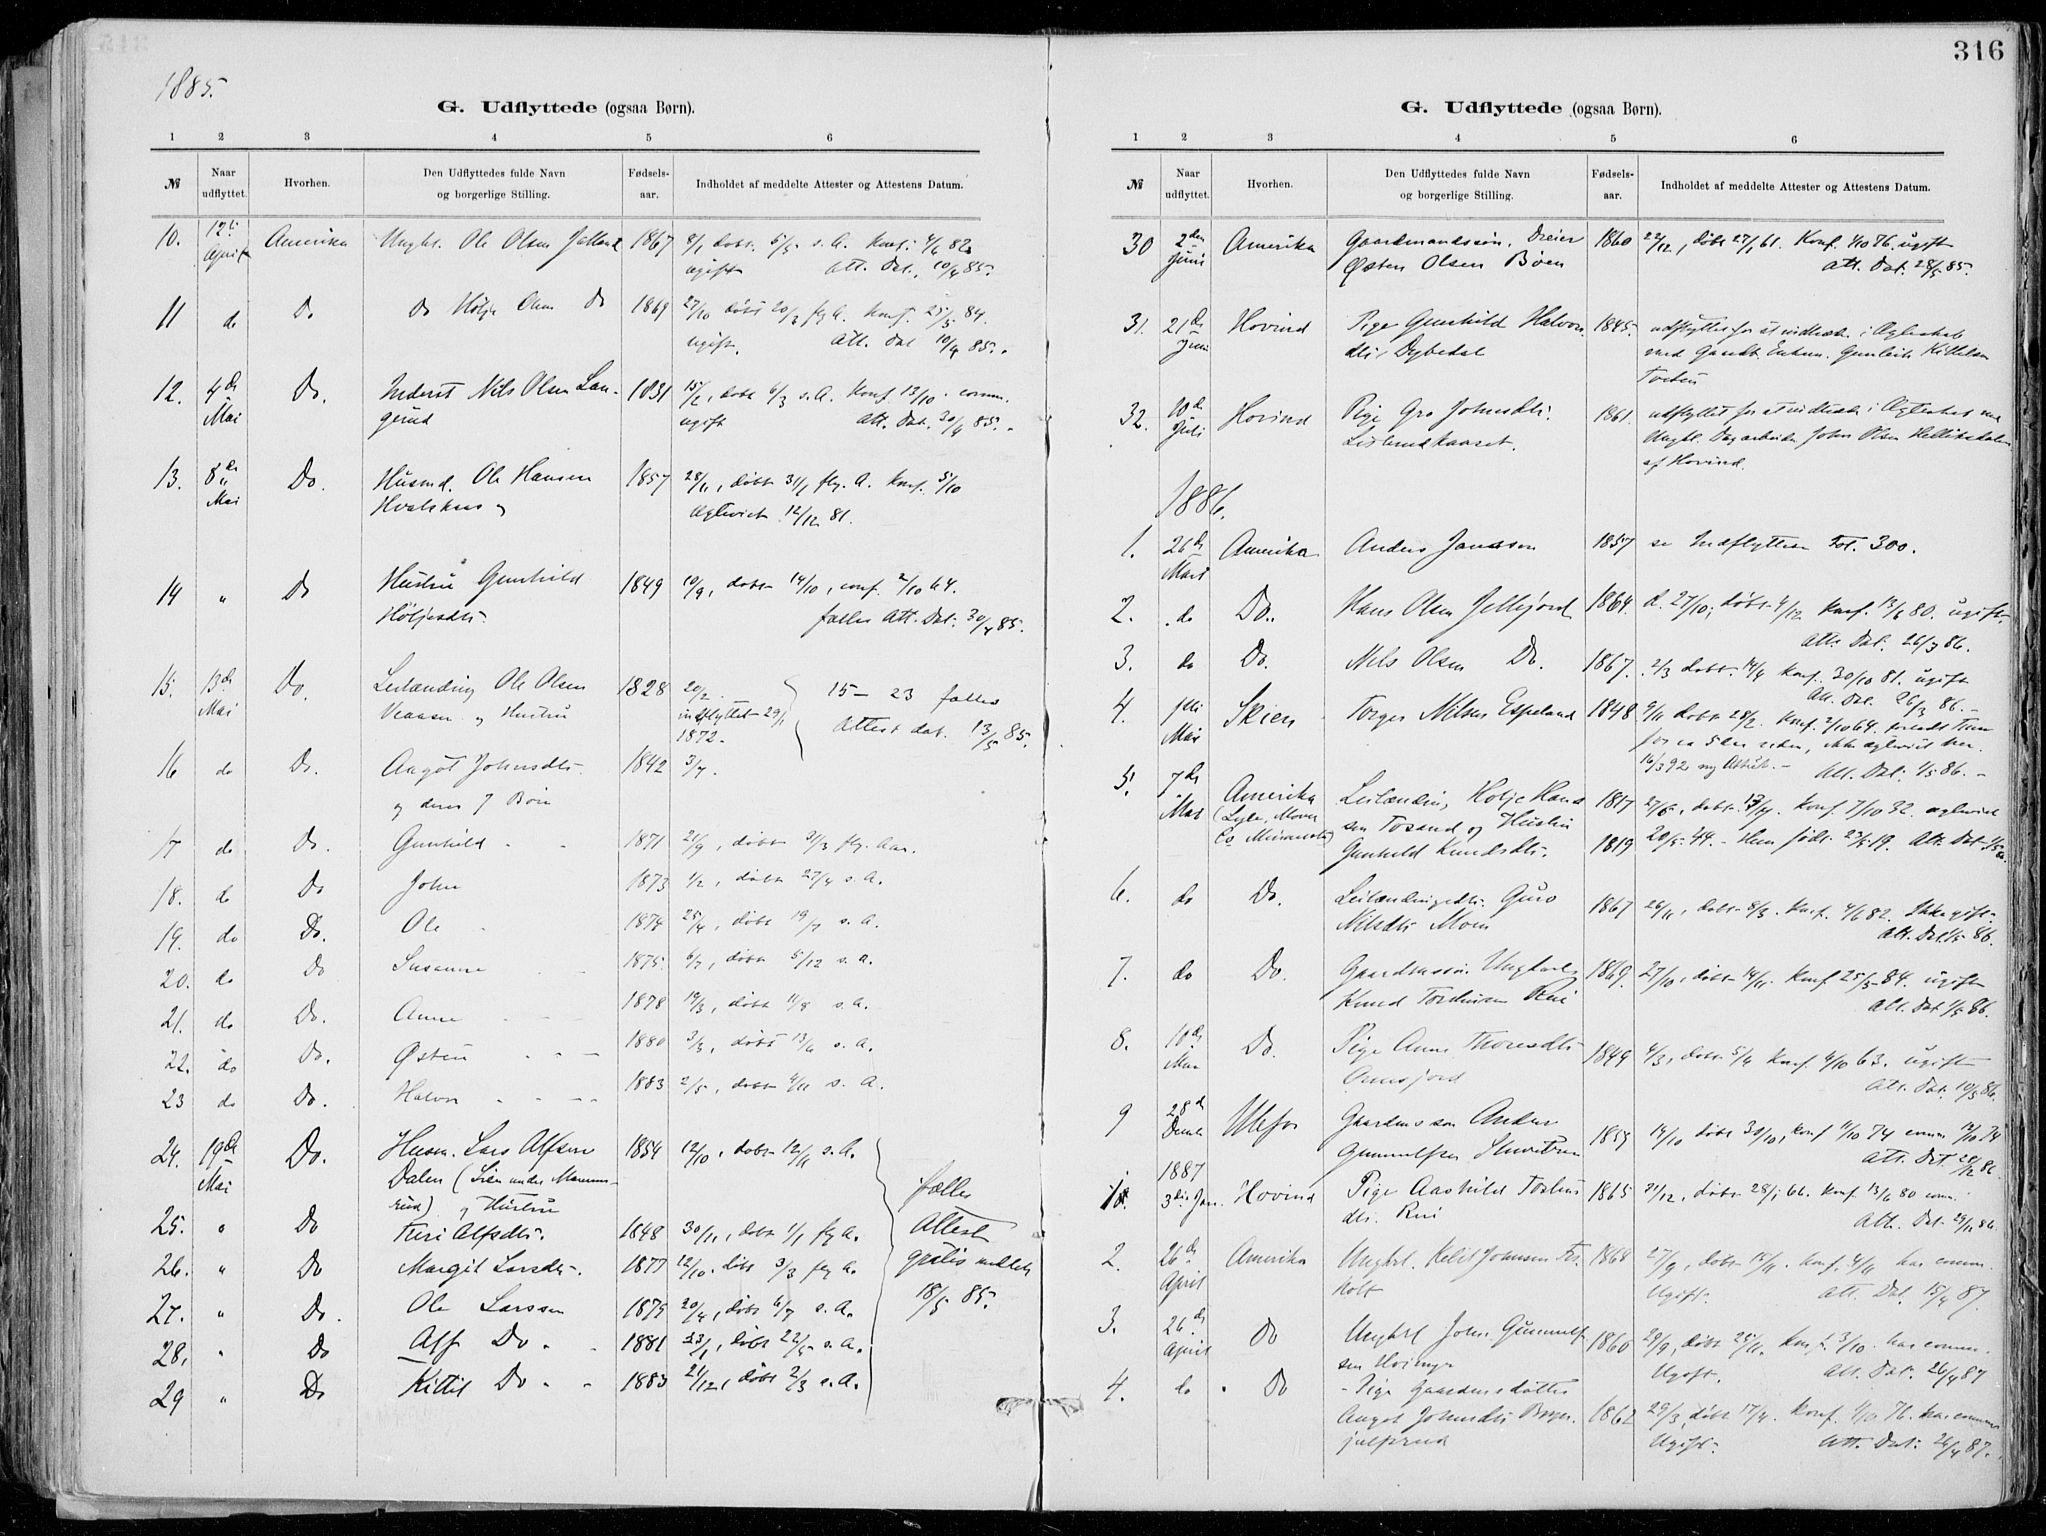 SAKO, Tinn kirkebøker, F/Fa/L0007: Ministerialbok nr. I 7, 1878-1922, s. 316